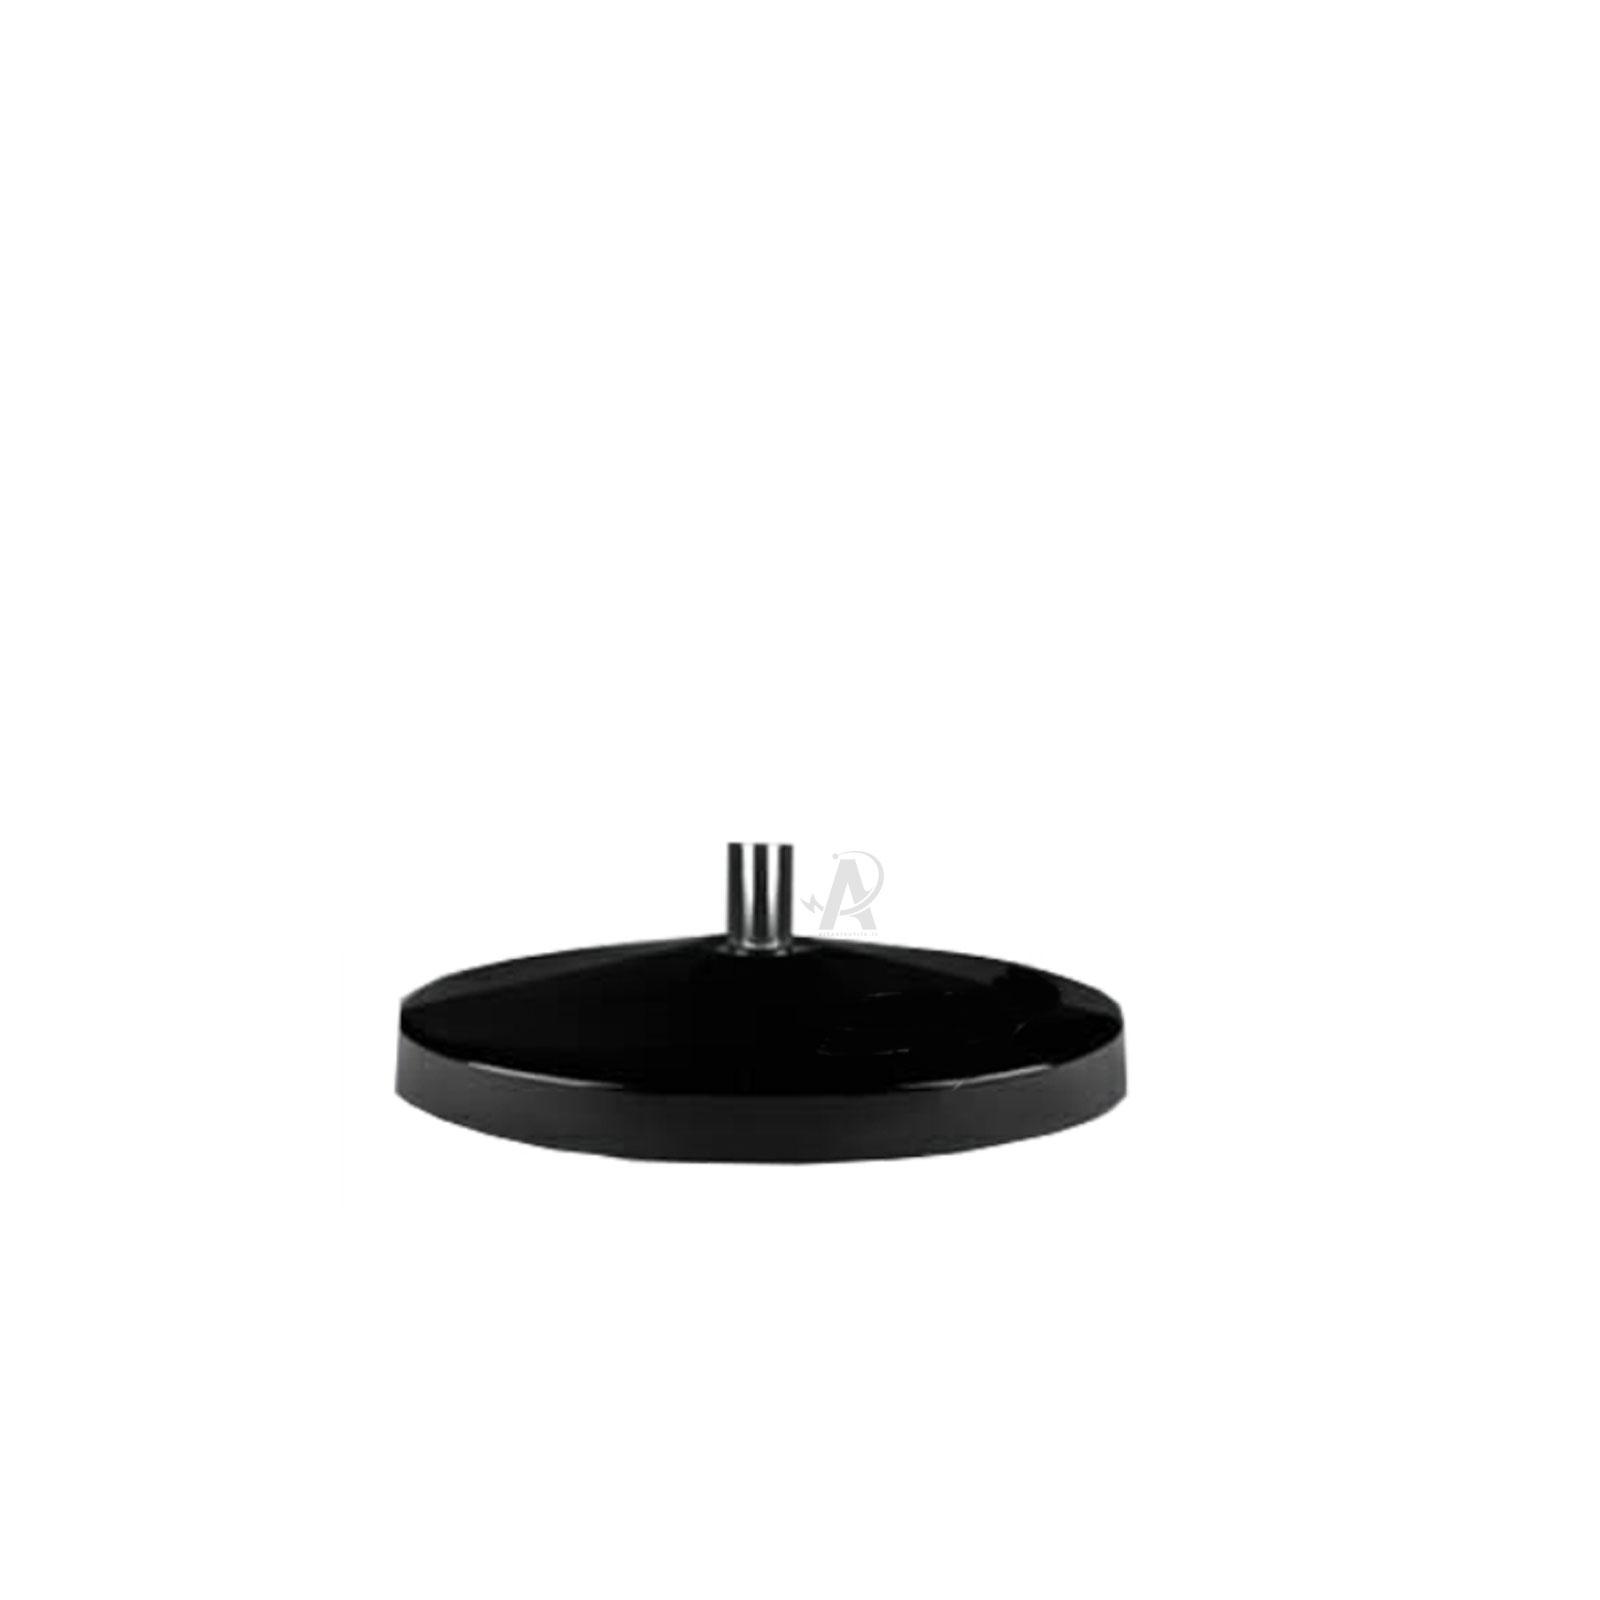 پایه کوتاه چراغ مهندسی BL-301A